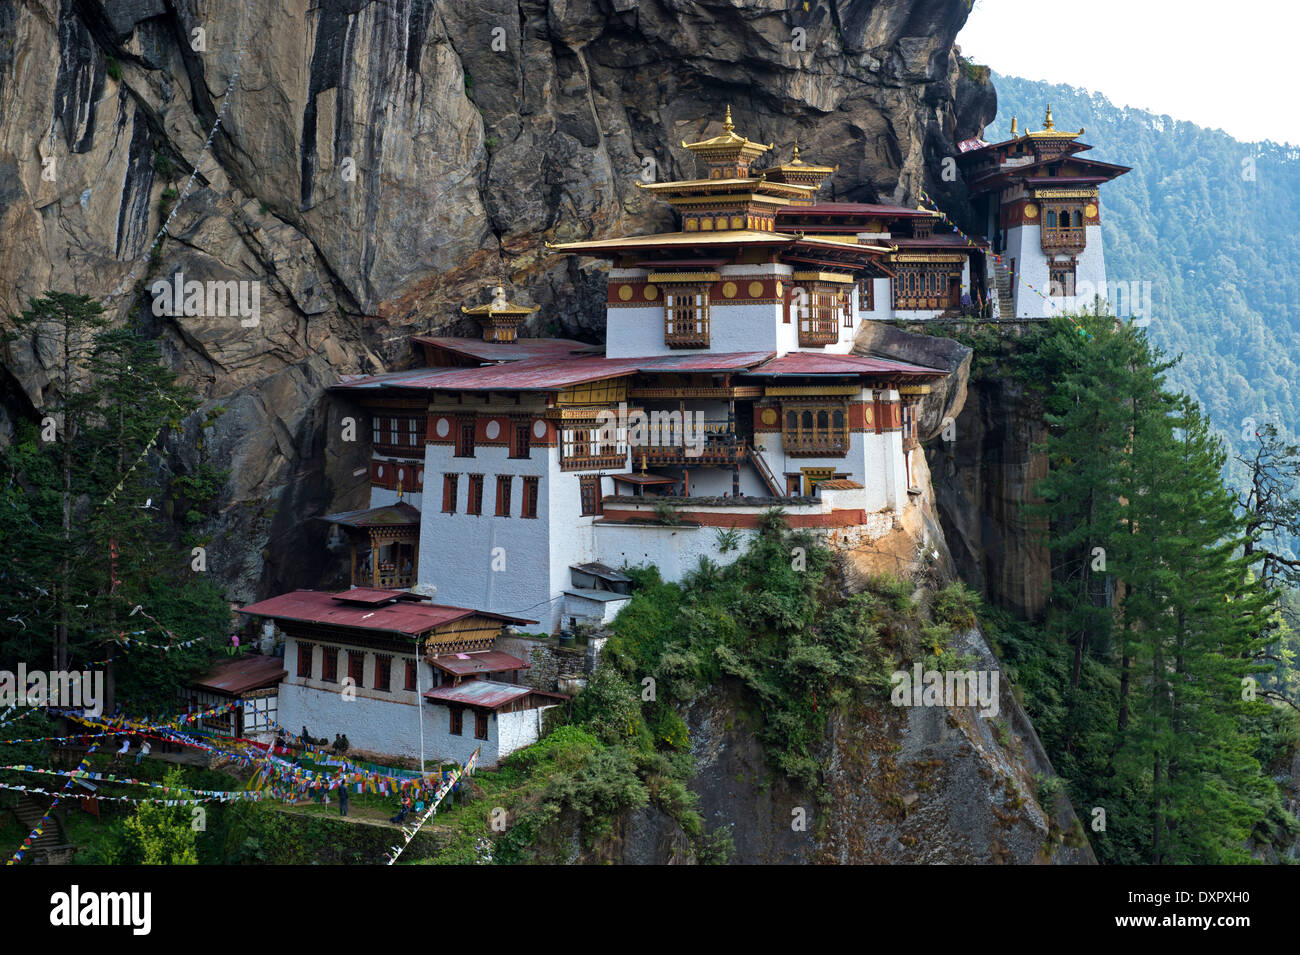 Der Tiger nest Kloster Taktsang Kloster palphug, Paro, Bhutan Stockfoto